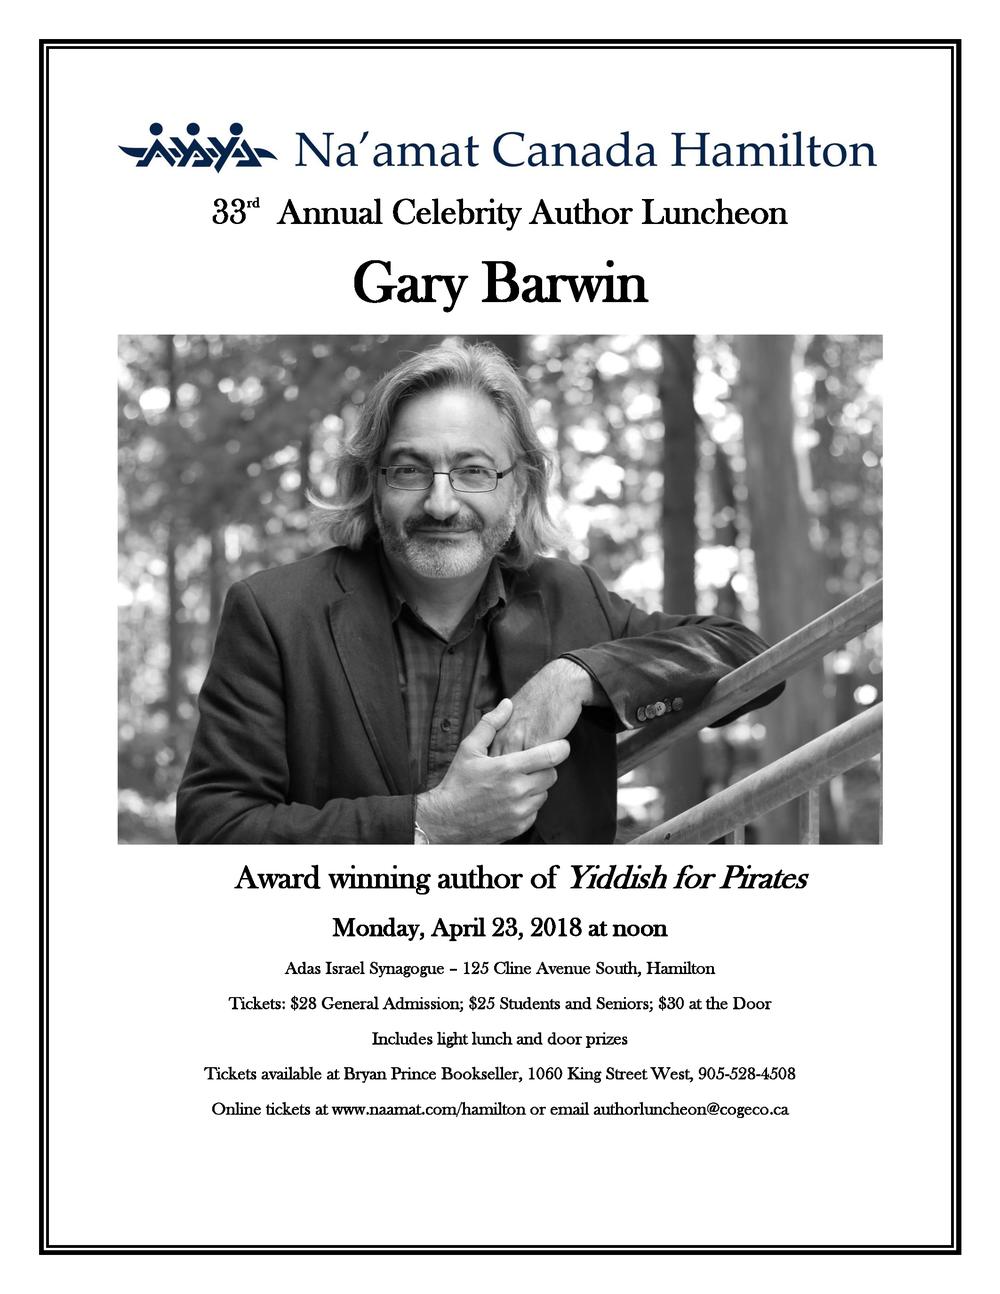 Gary Barwin flyer - Final[1].png